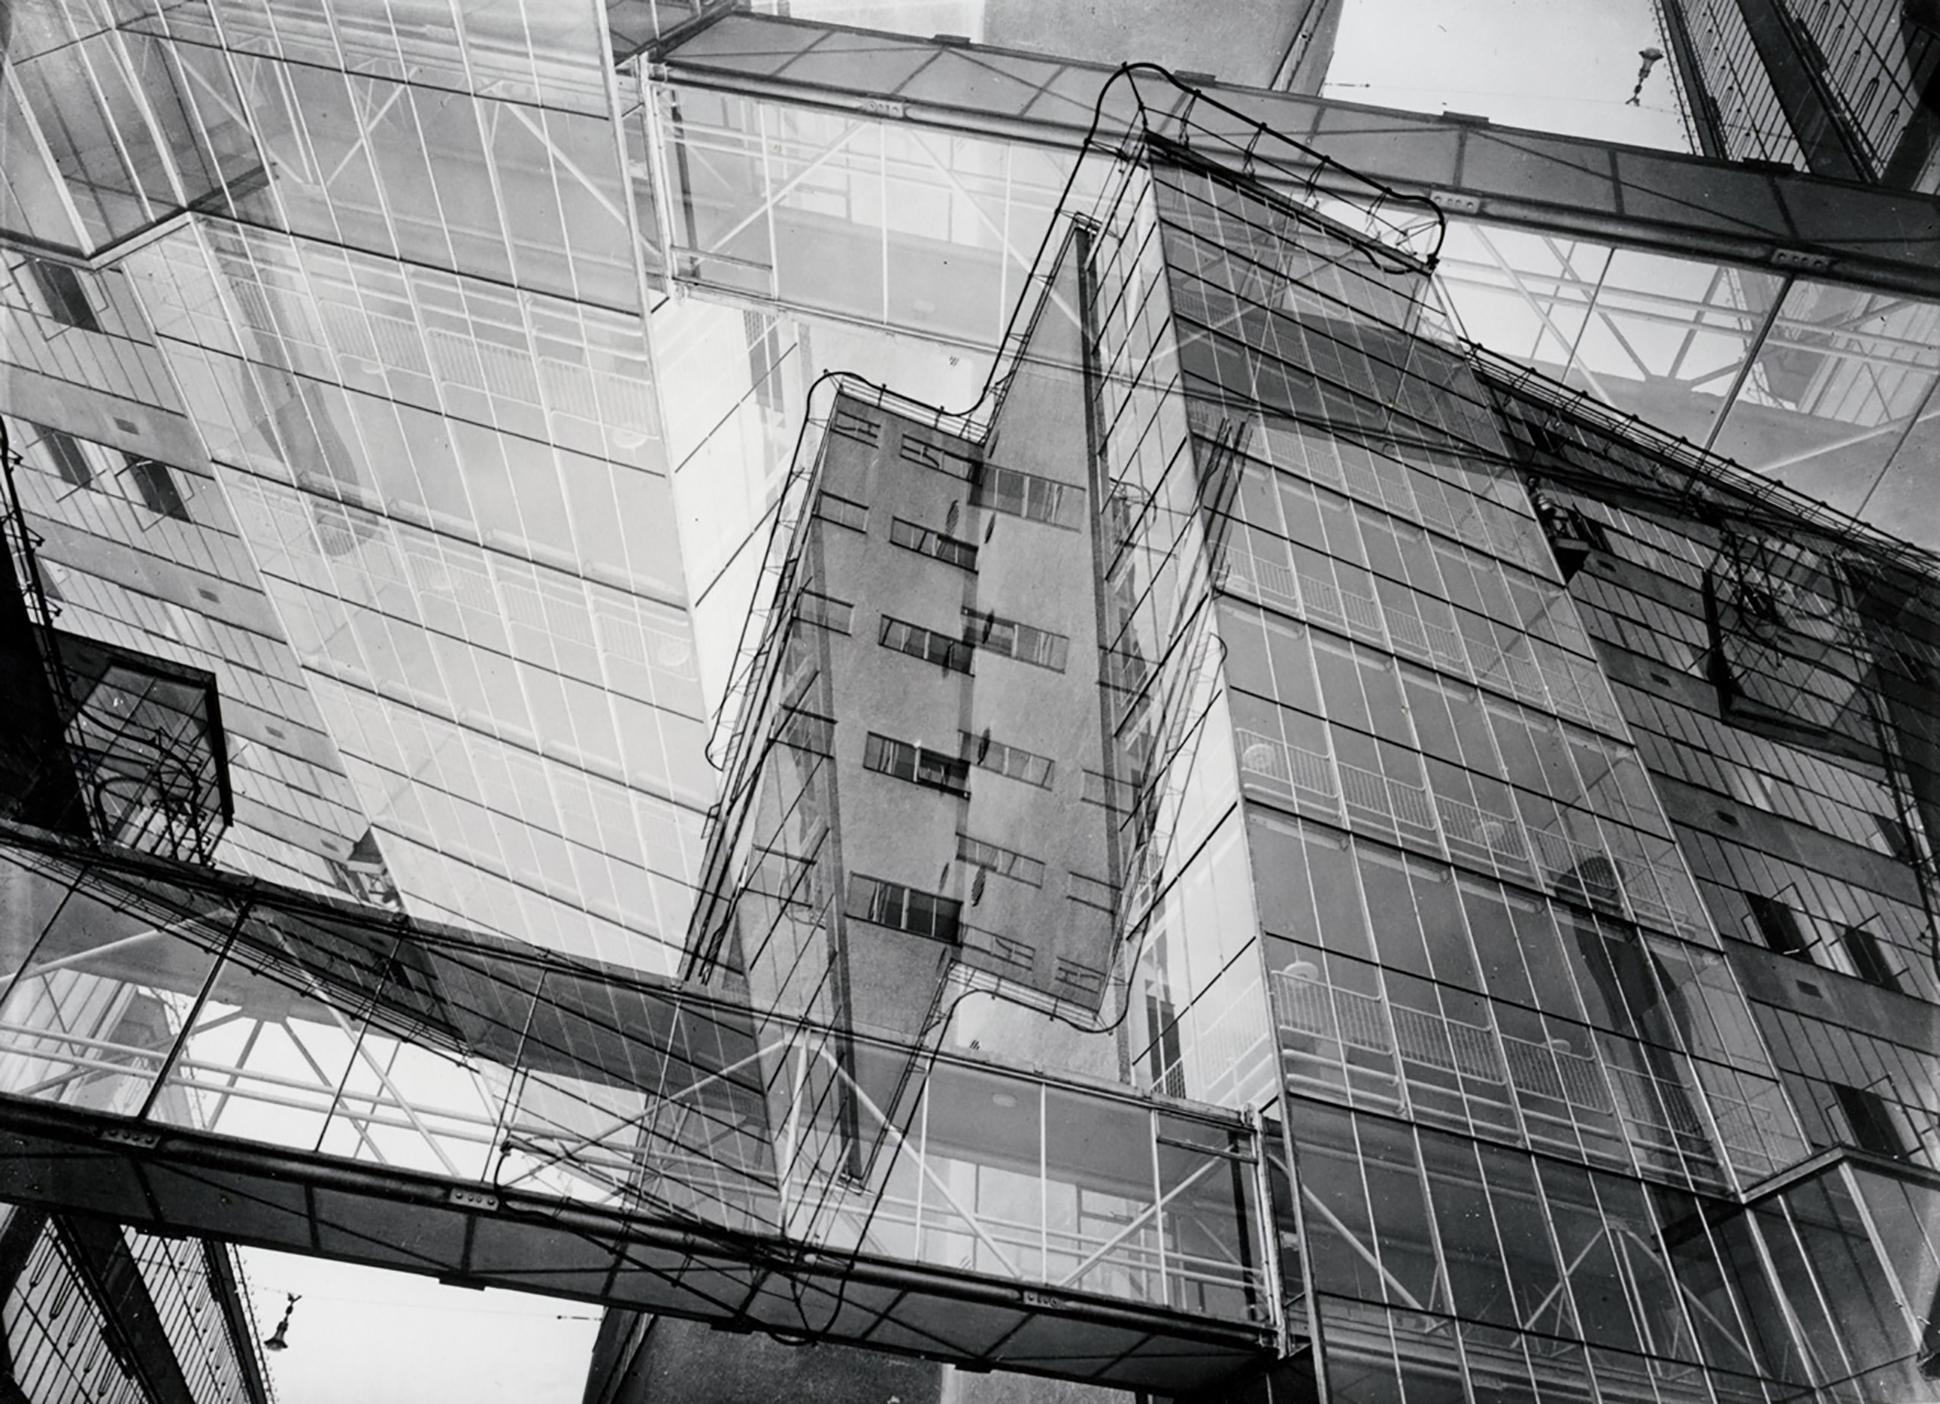 Jan Kamman, Van Nellefabriek. Rotterdam. c. 1930 negatiefmontage